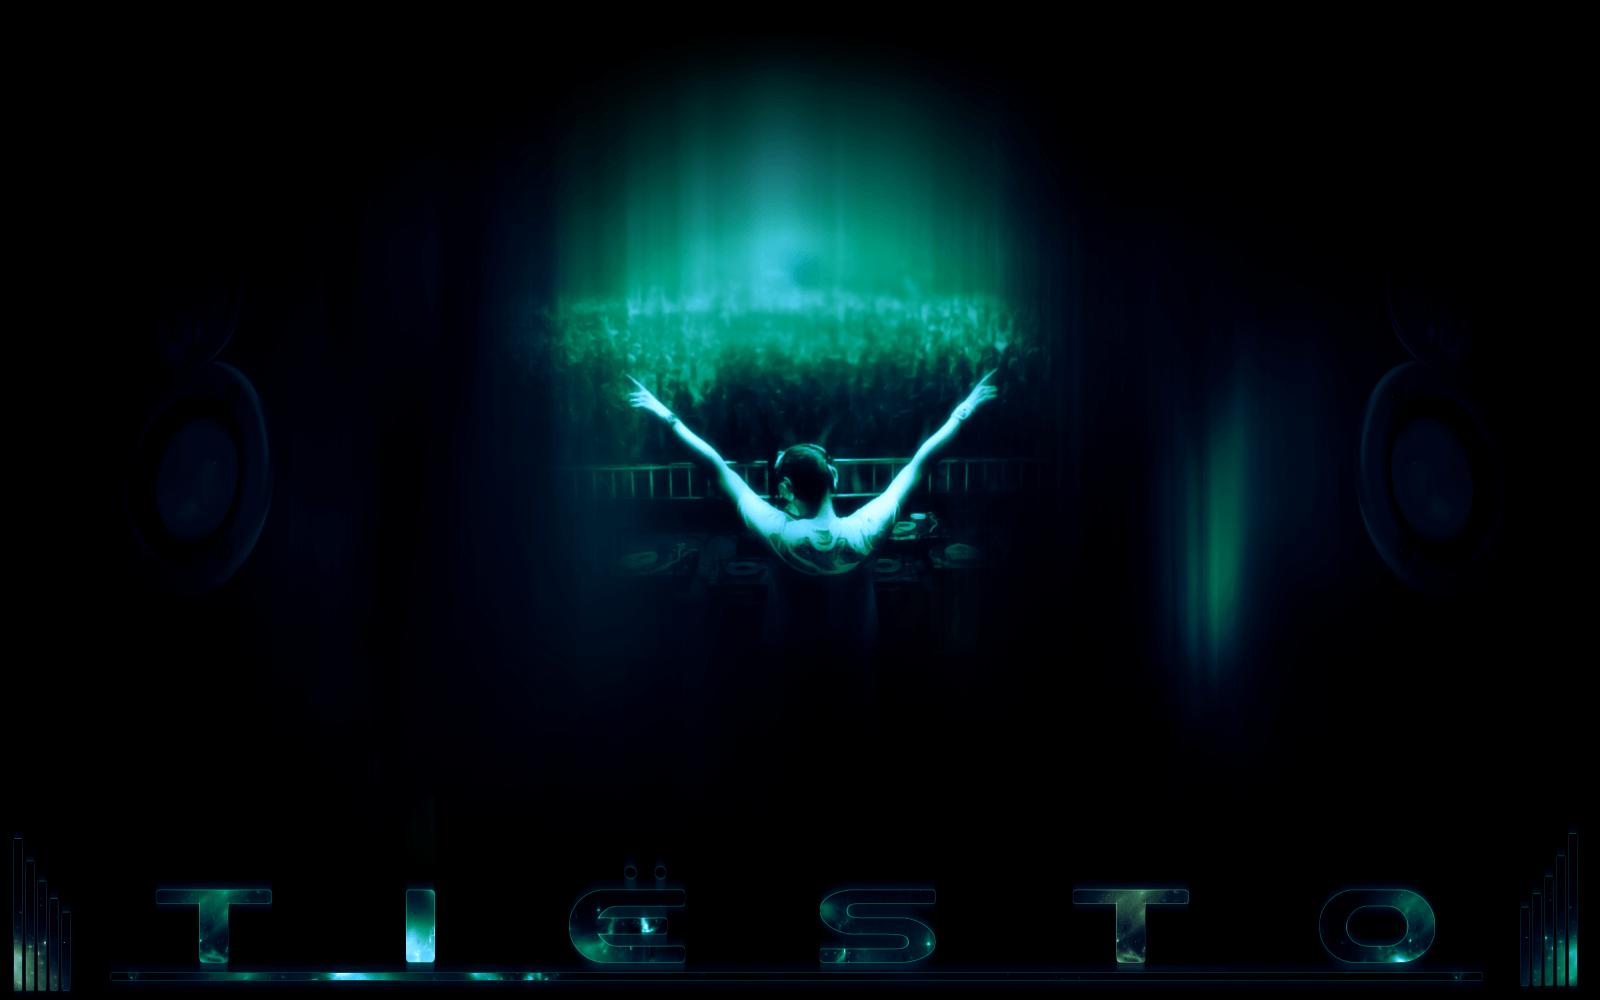 DJ Tiesto Wallpapers 2015 - Wallpaper - 251.4KB